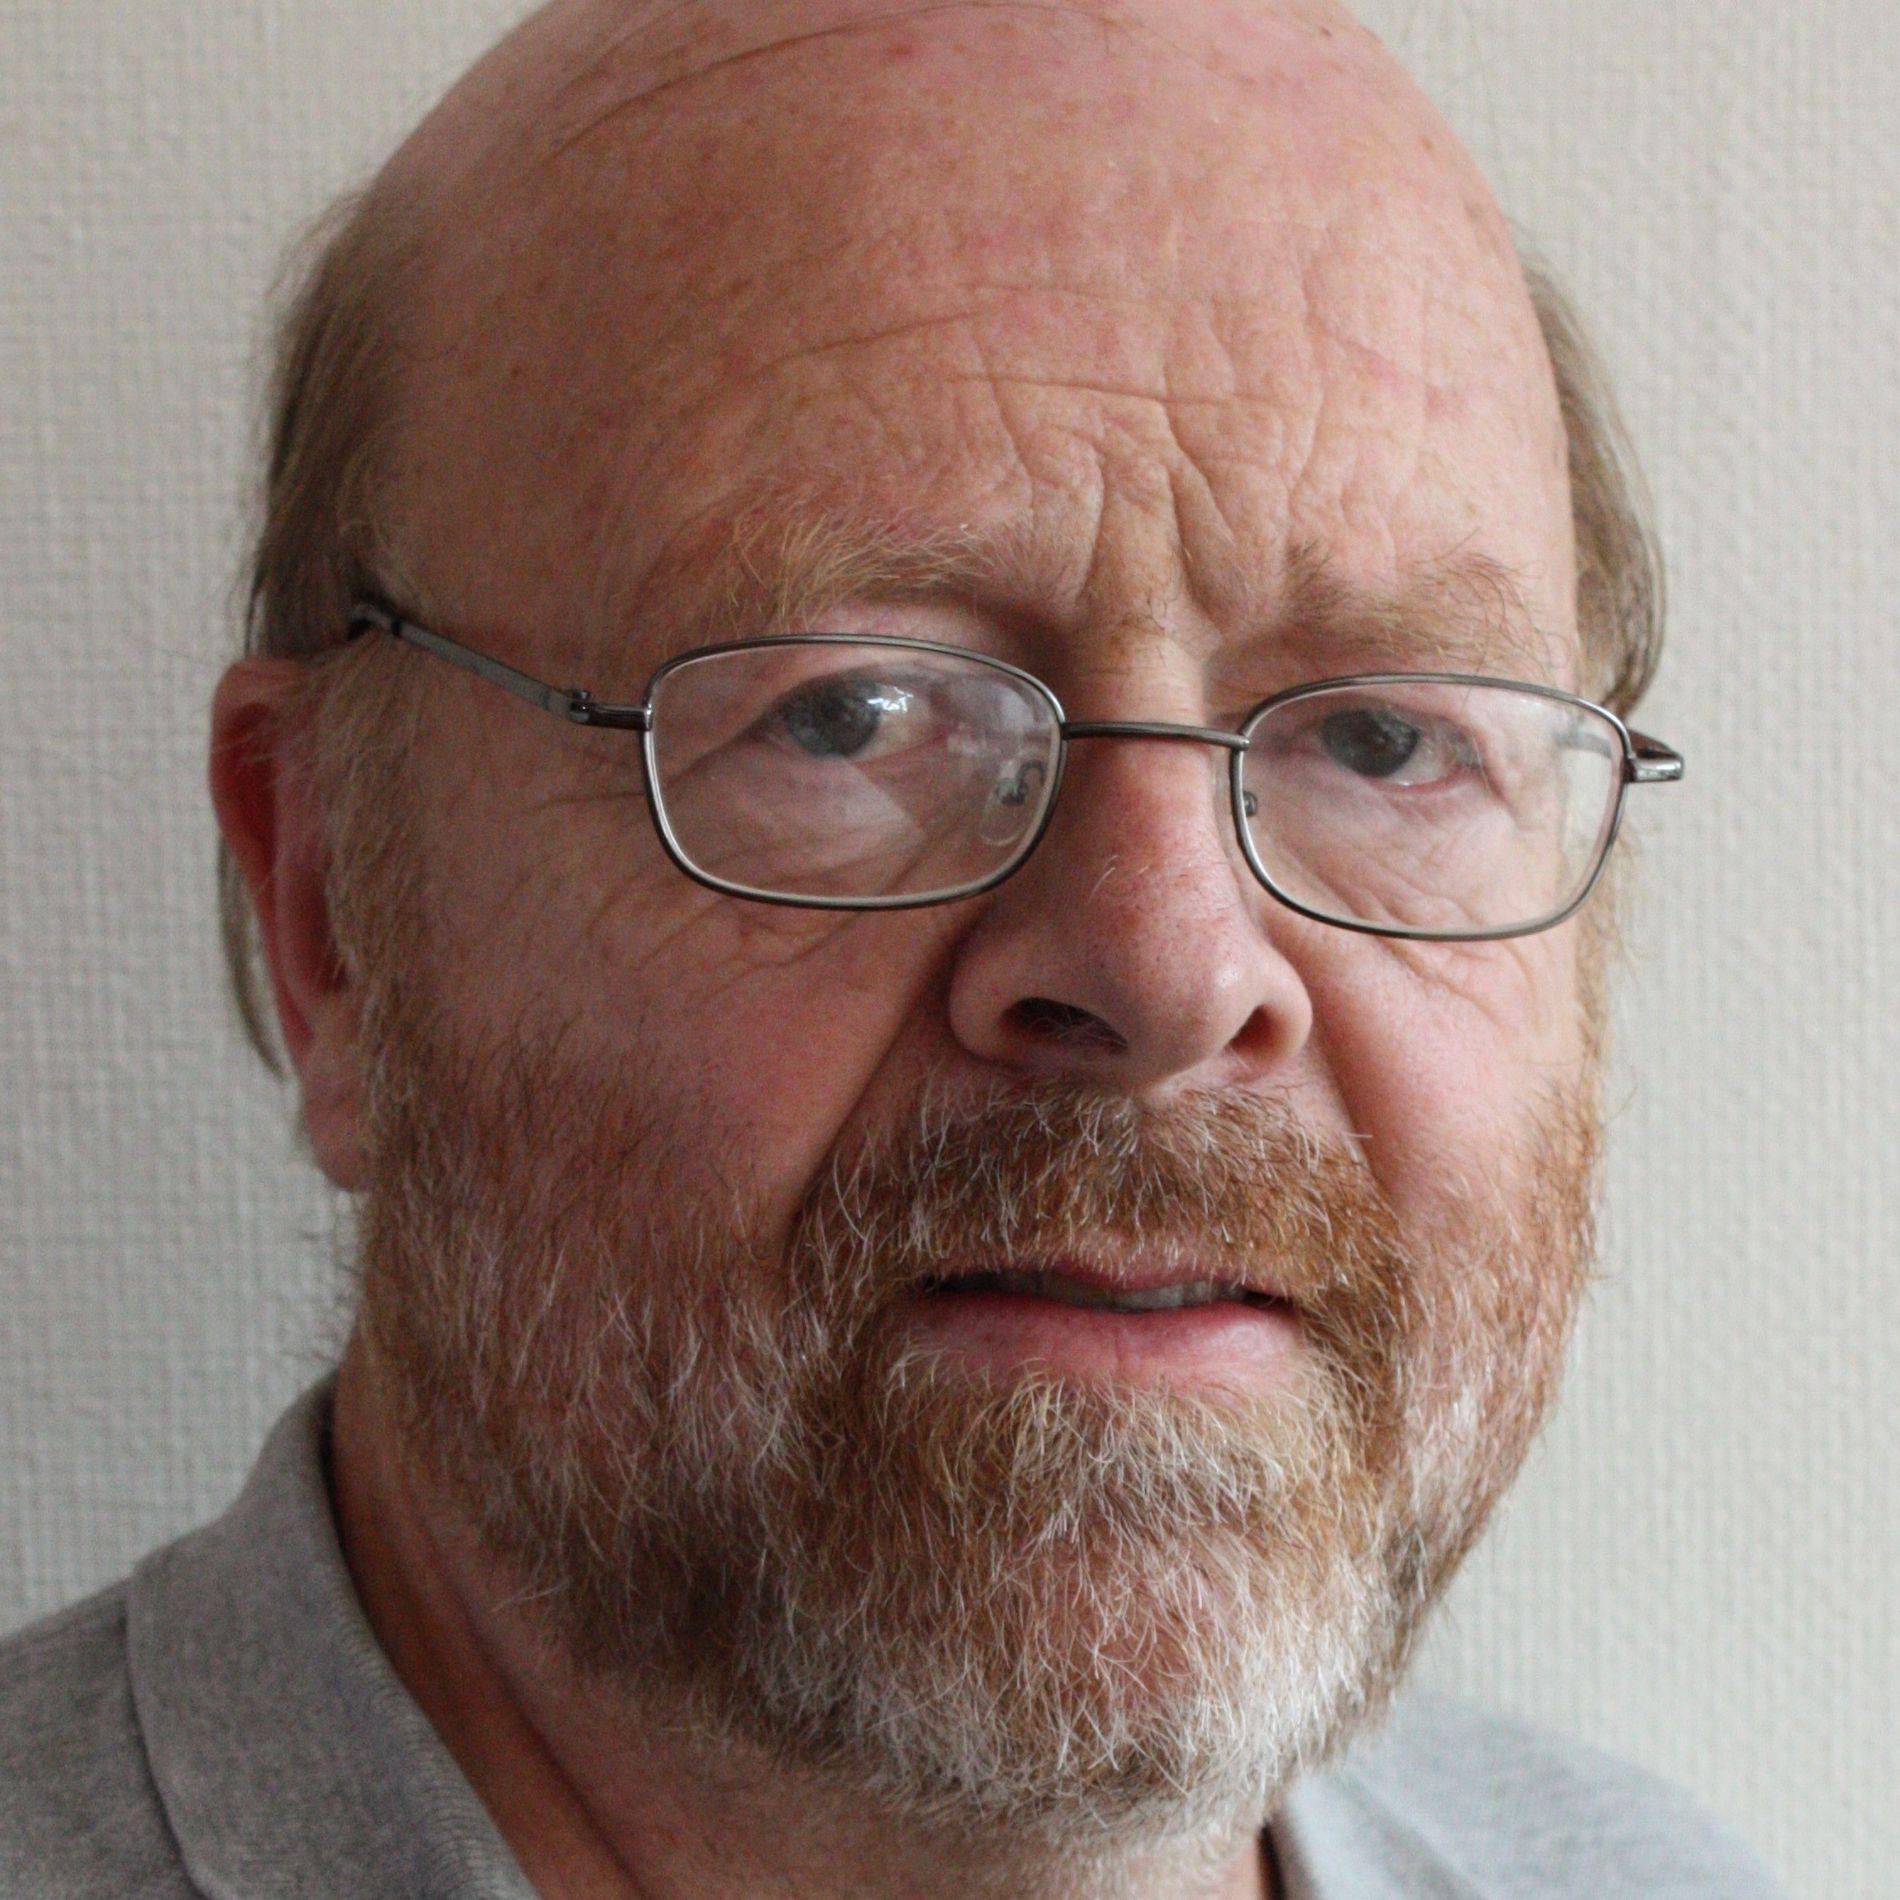 Torgeir M. Hillestad